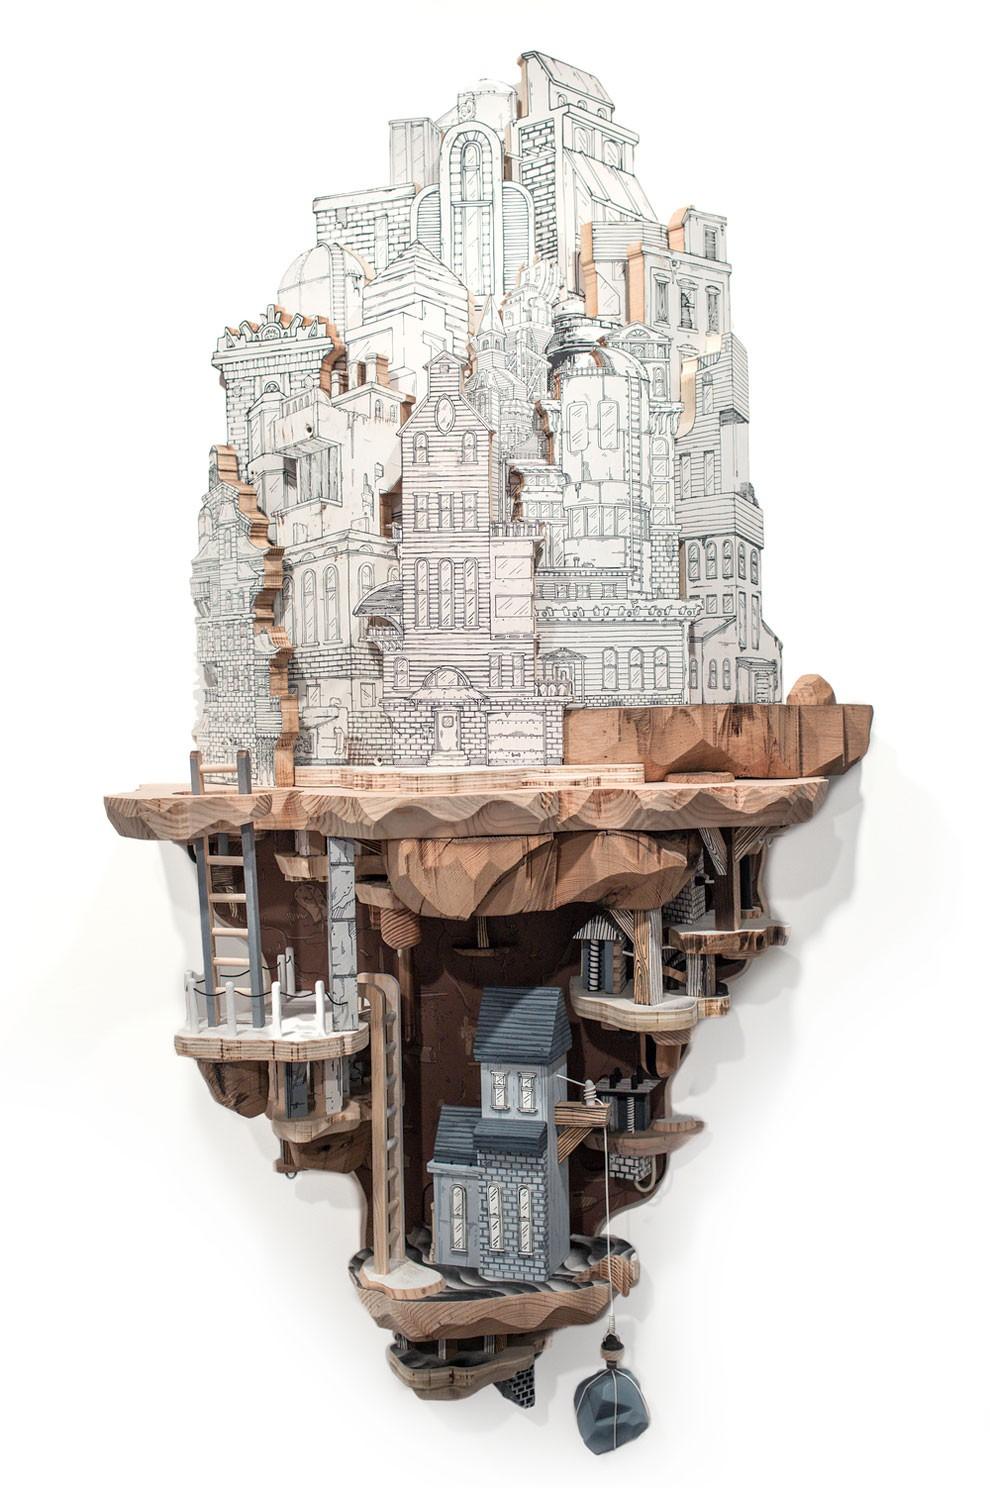 illustrazioni-scultura-mondi-miniatura-architettura-luke-o-sullivan-01